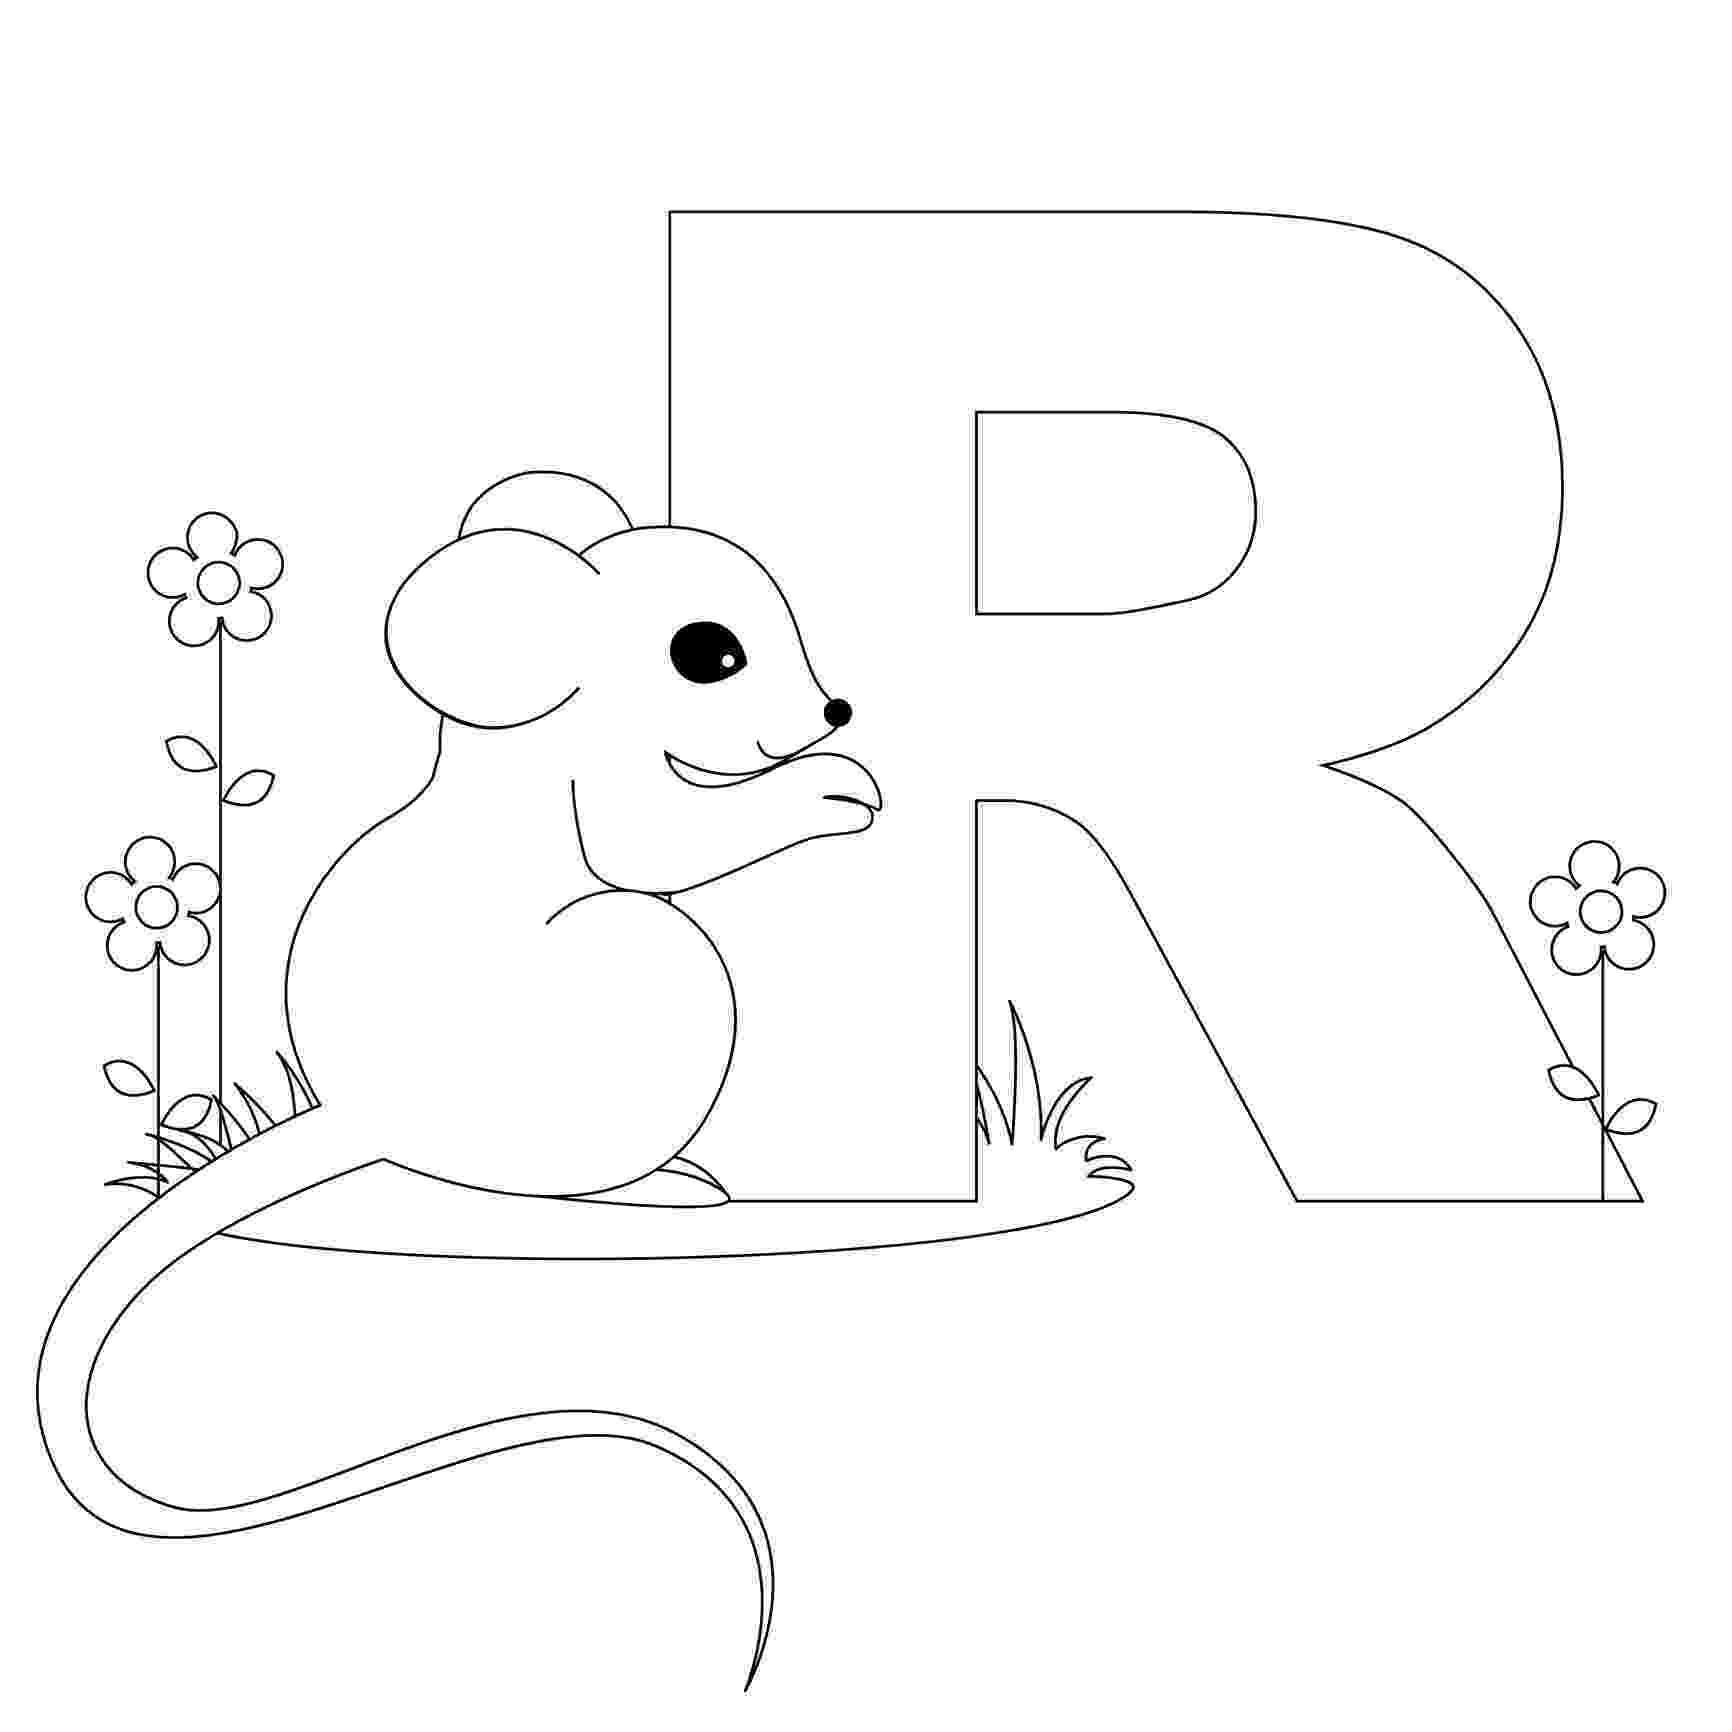 abc coloring sheets free printable alphabet coloring pages for kids best coloring sheets abc